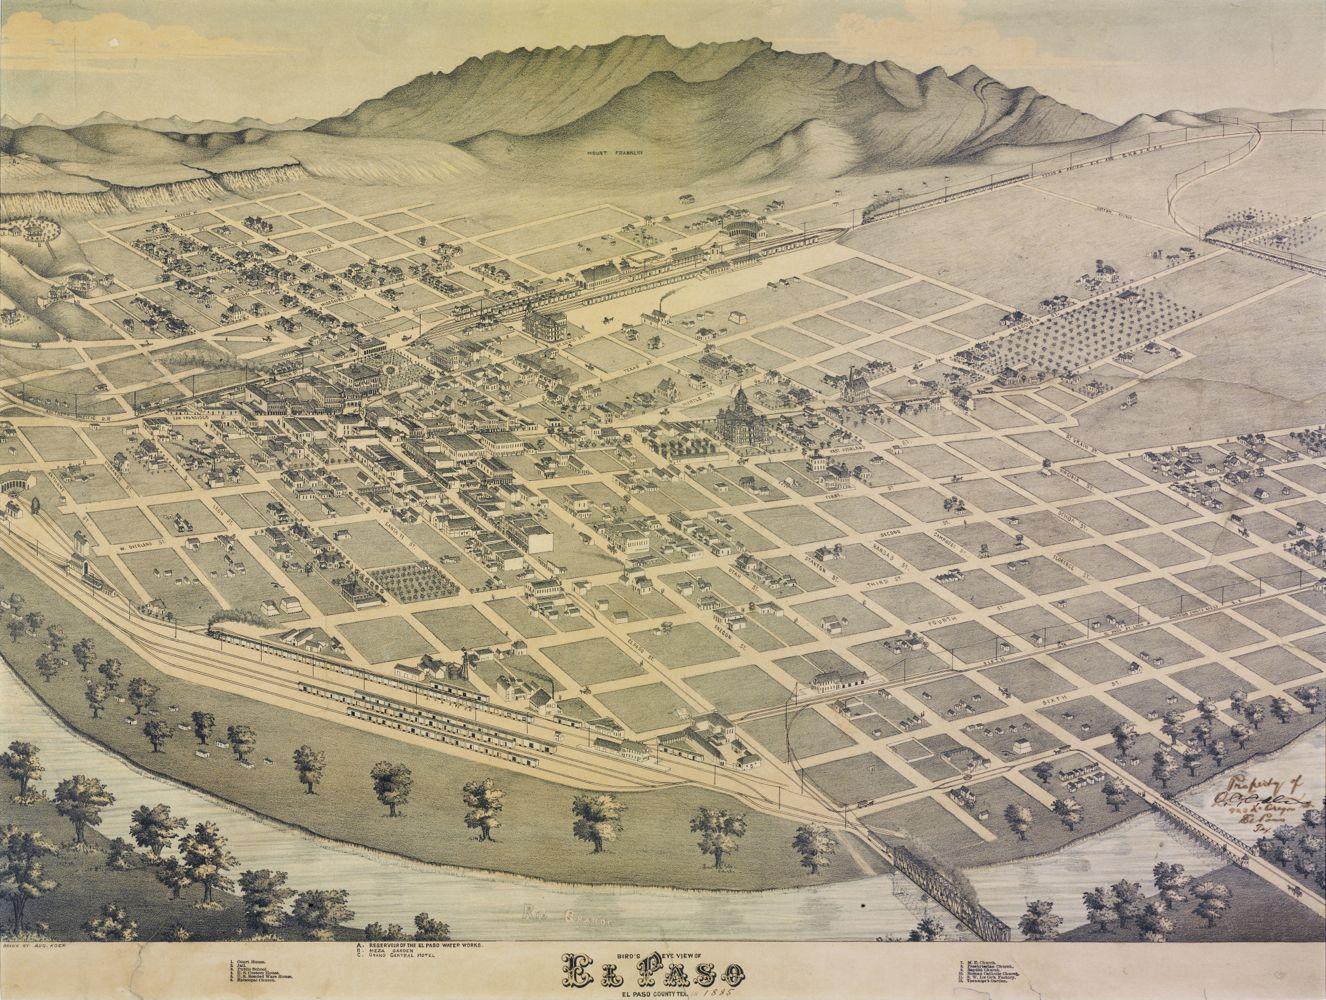 Old_map-El_PasoBaja